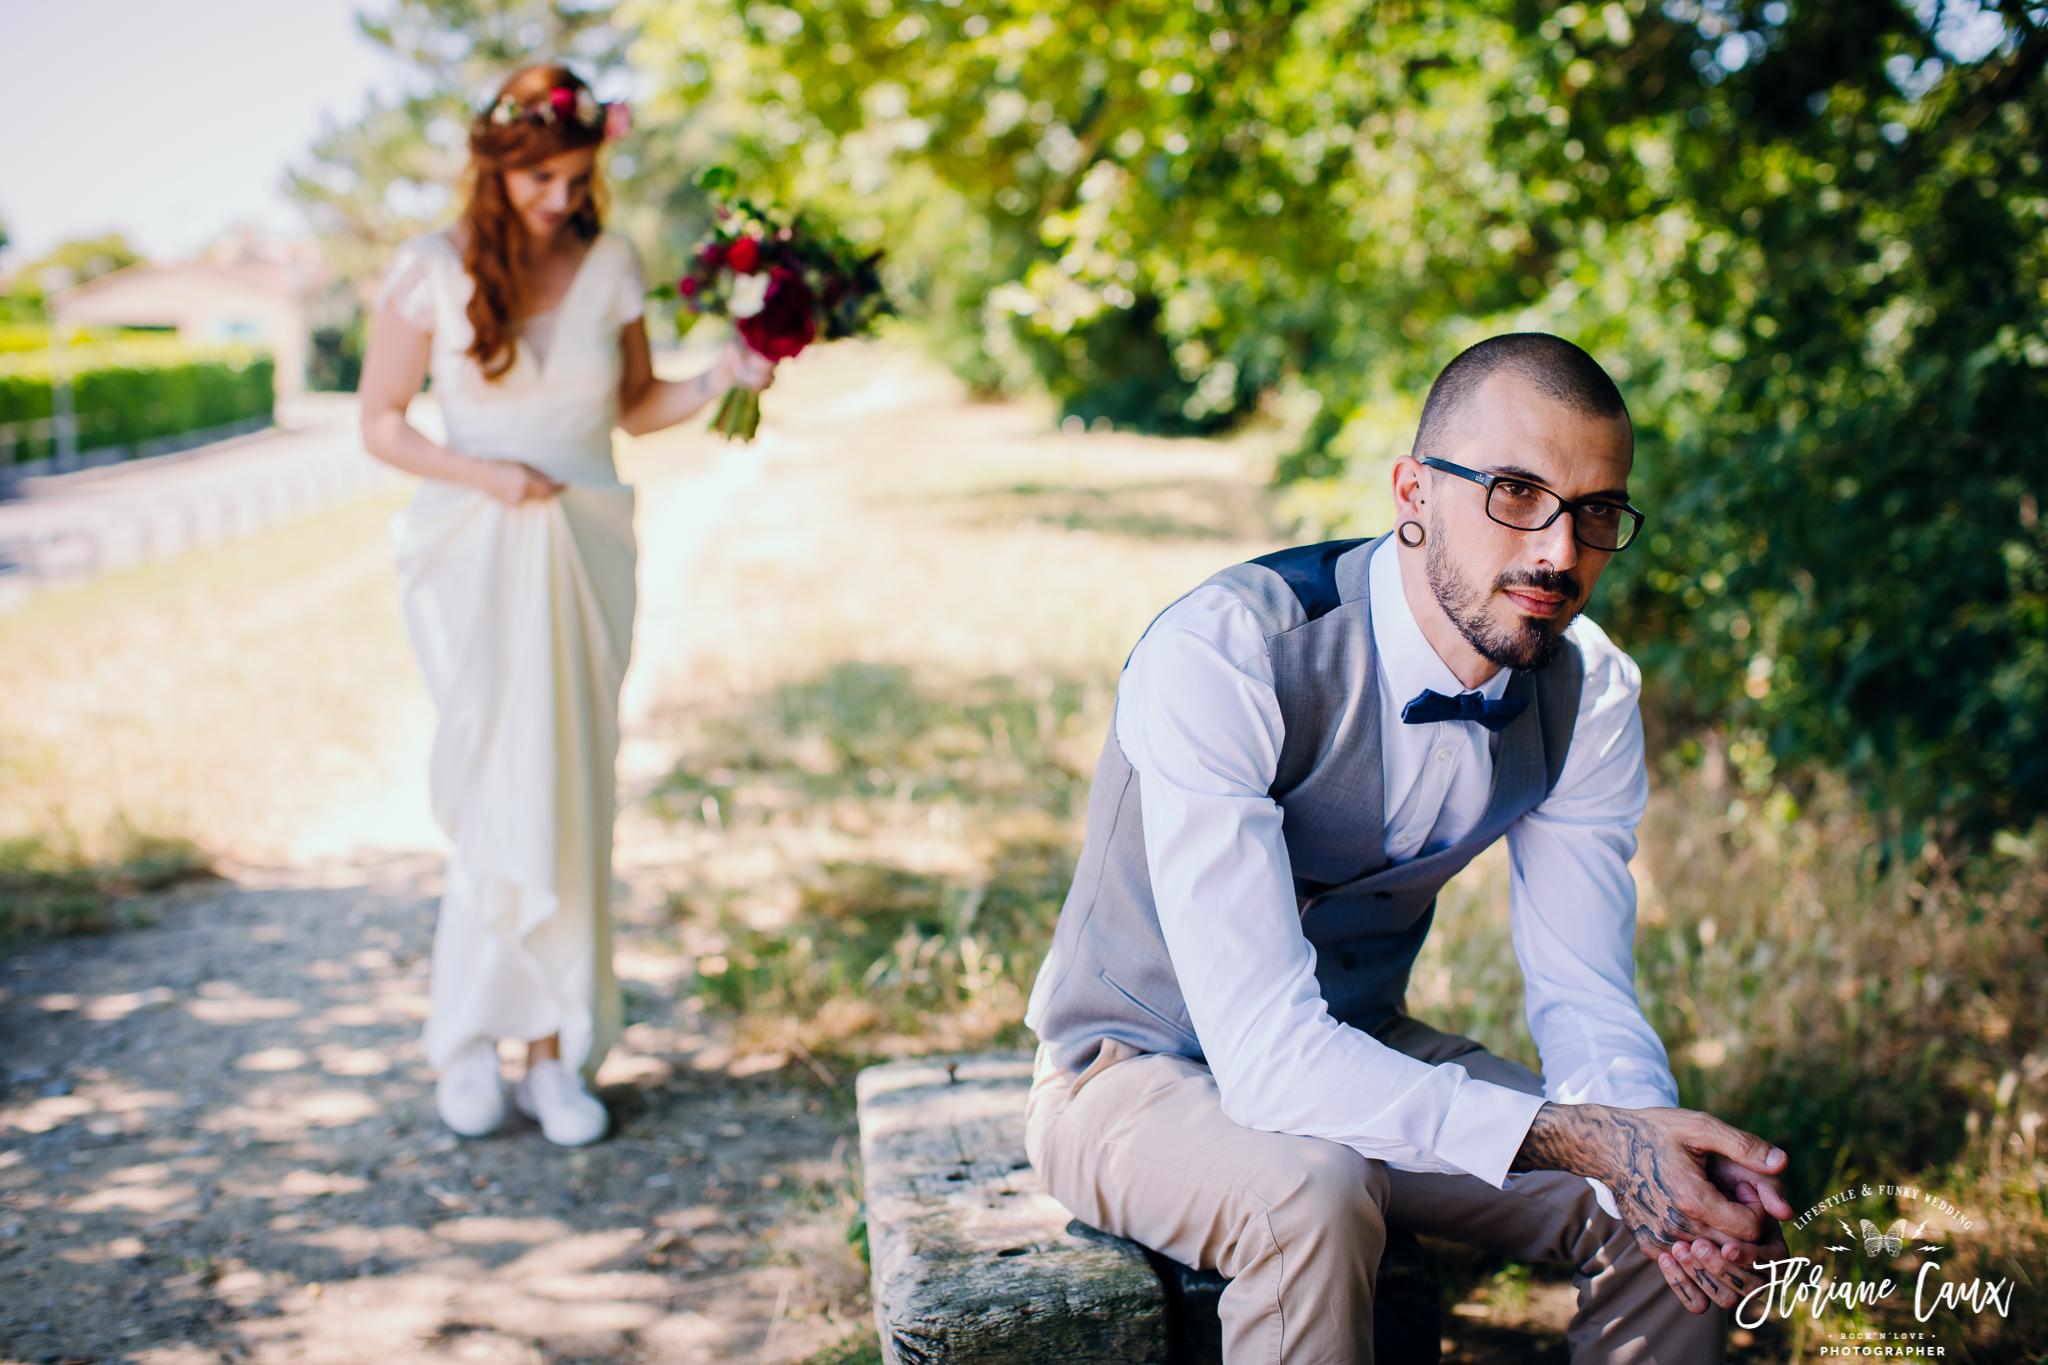 photographe-mariage-toulouse-rocknroll-maries-tatoues-floriane-caux-17